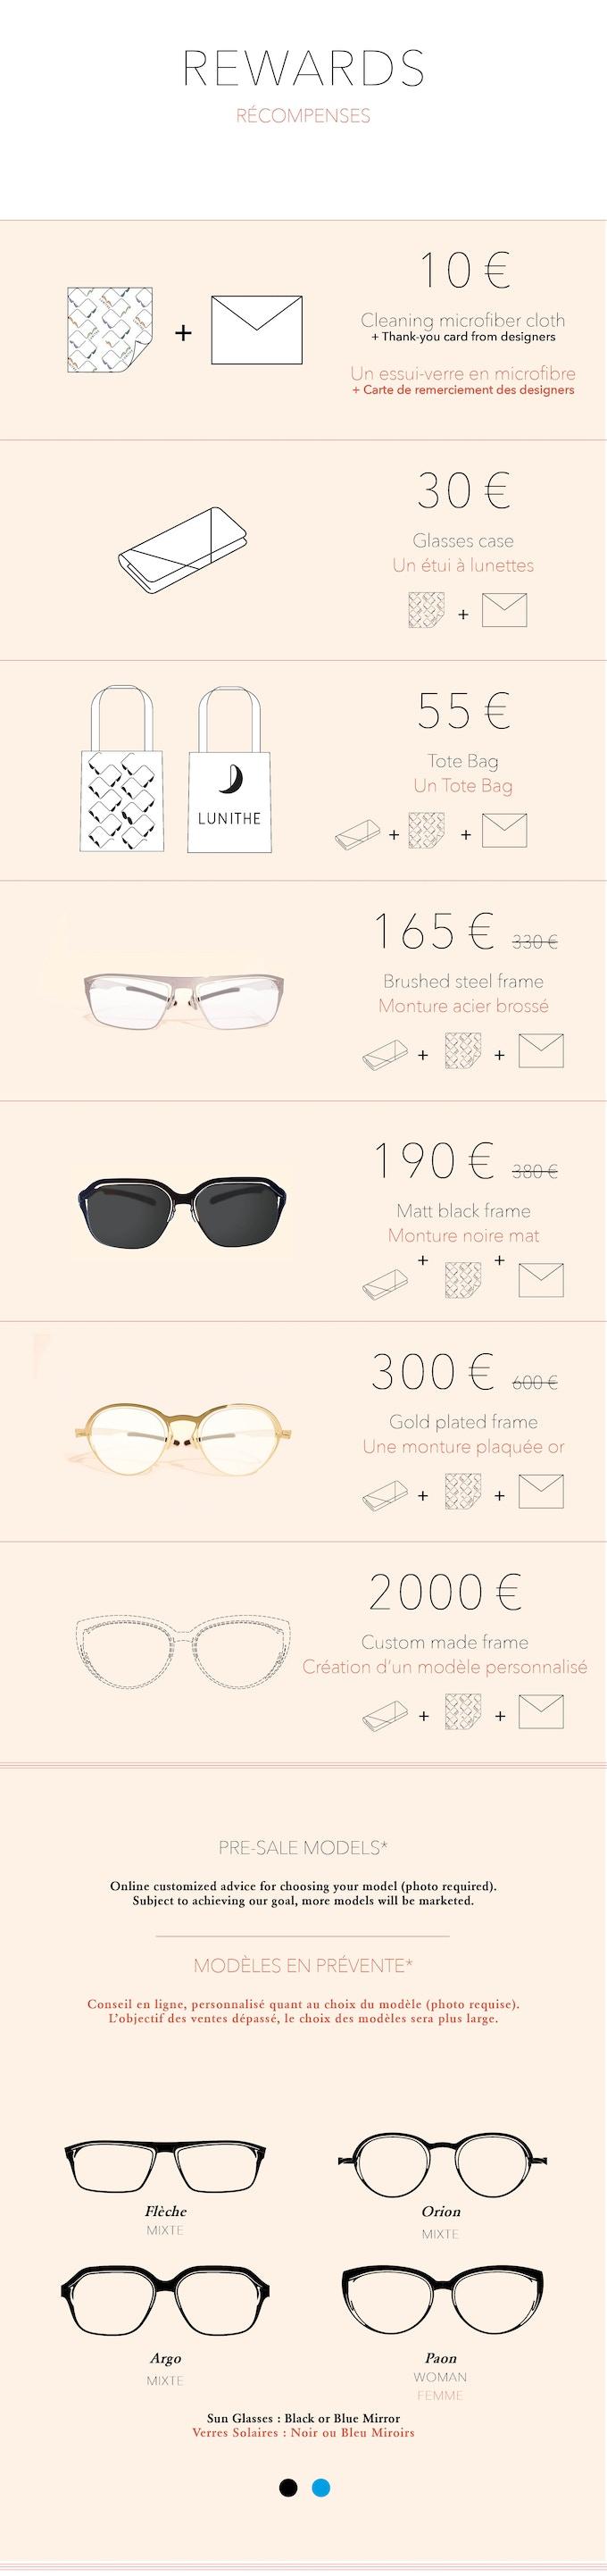 Optical frames or Sun glasses - Montures Otiques ou Solaires